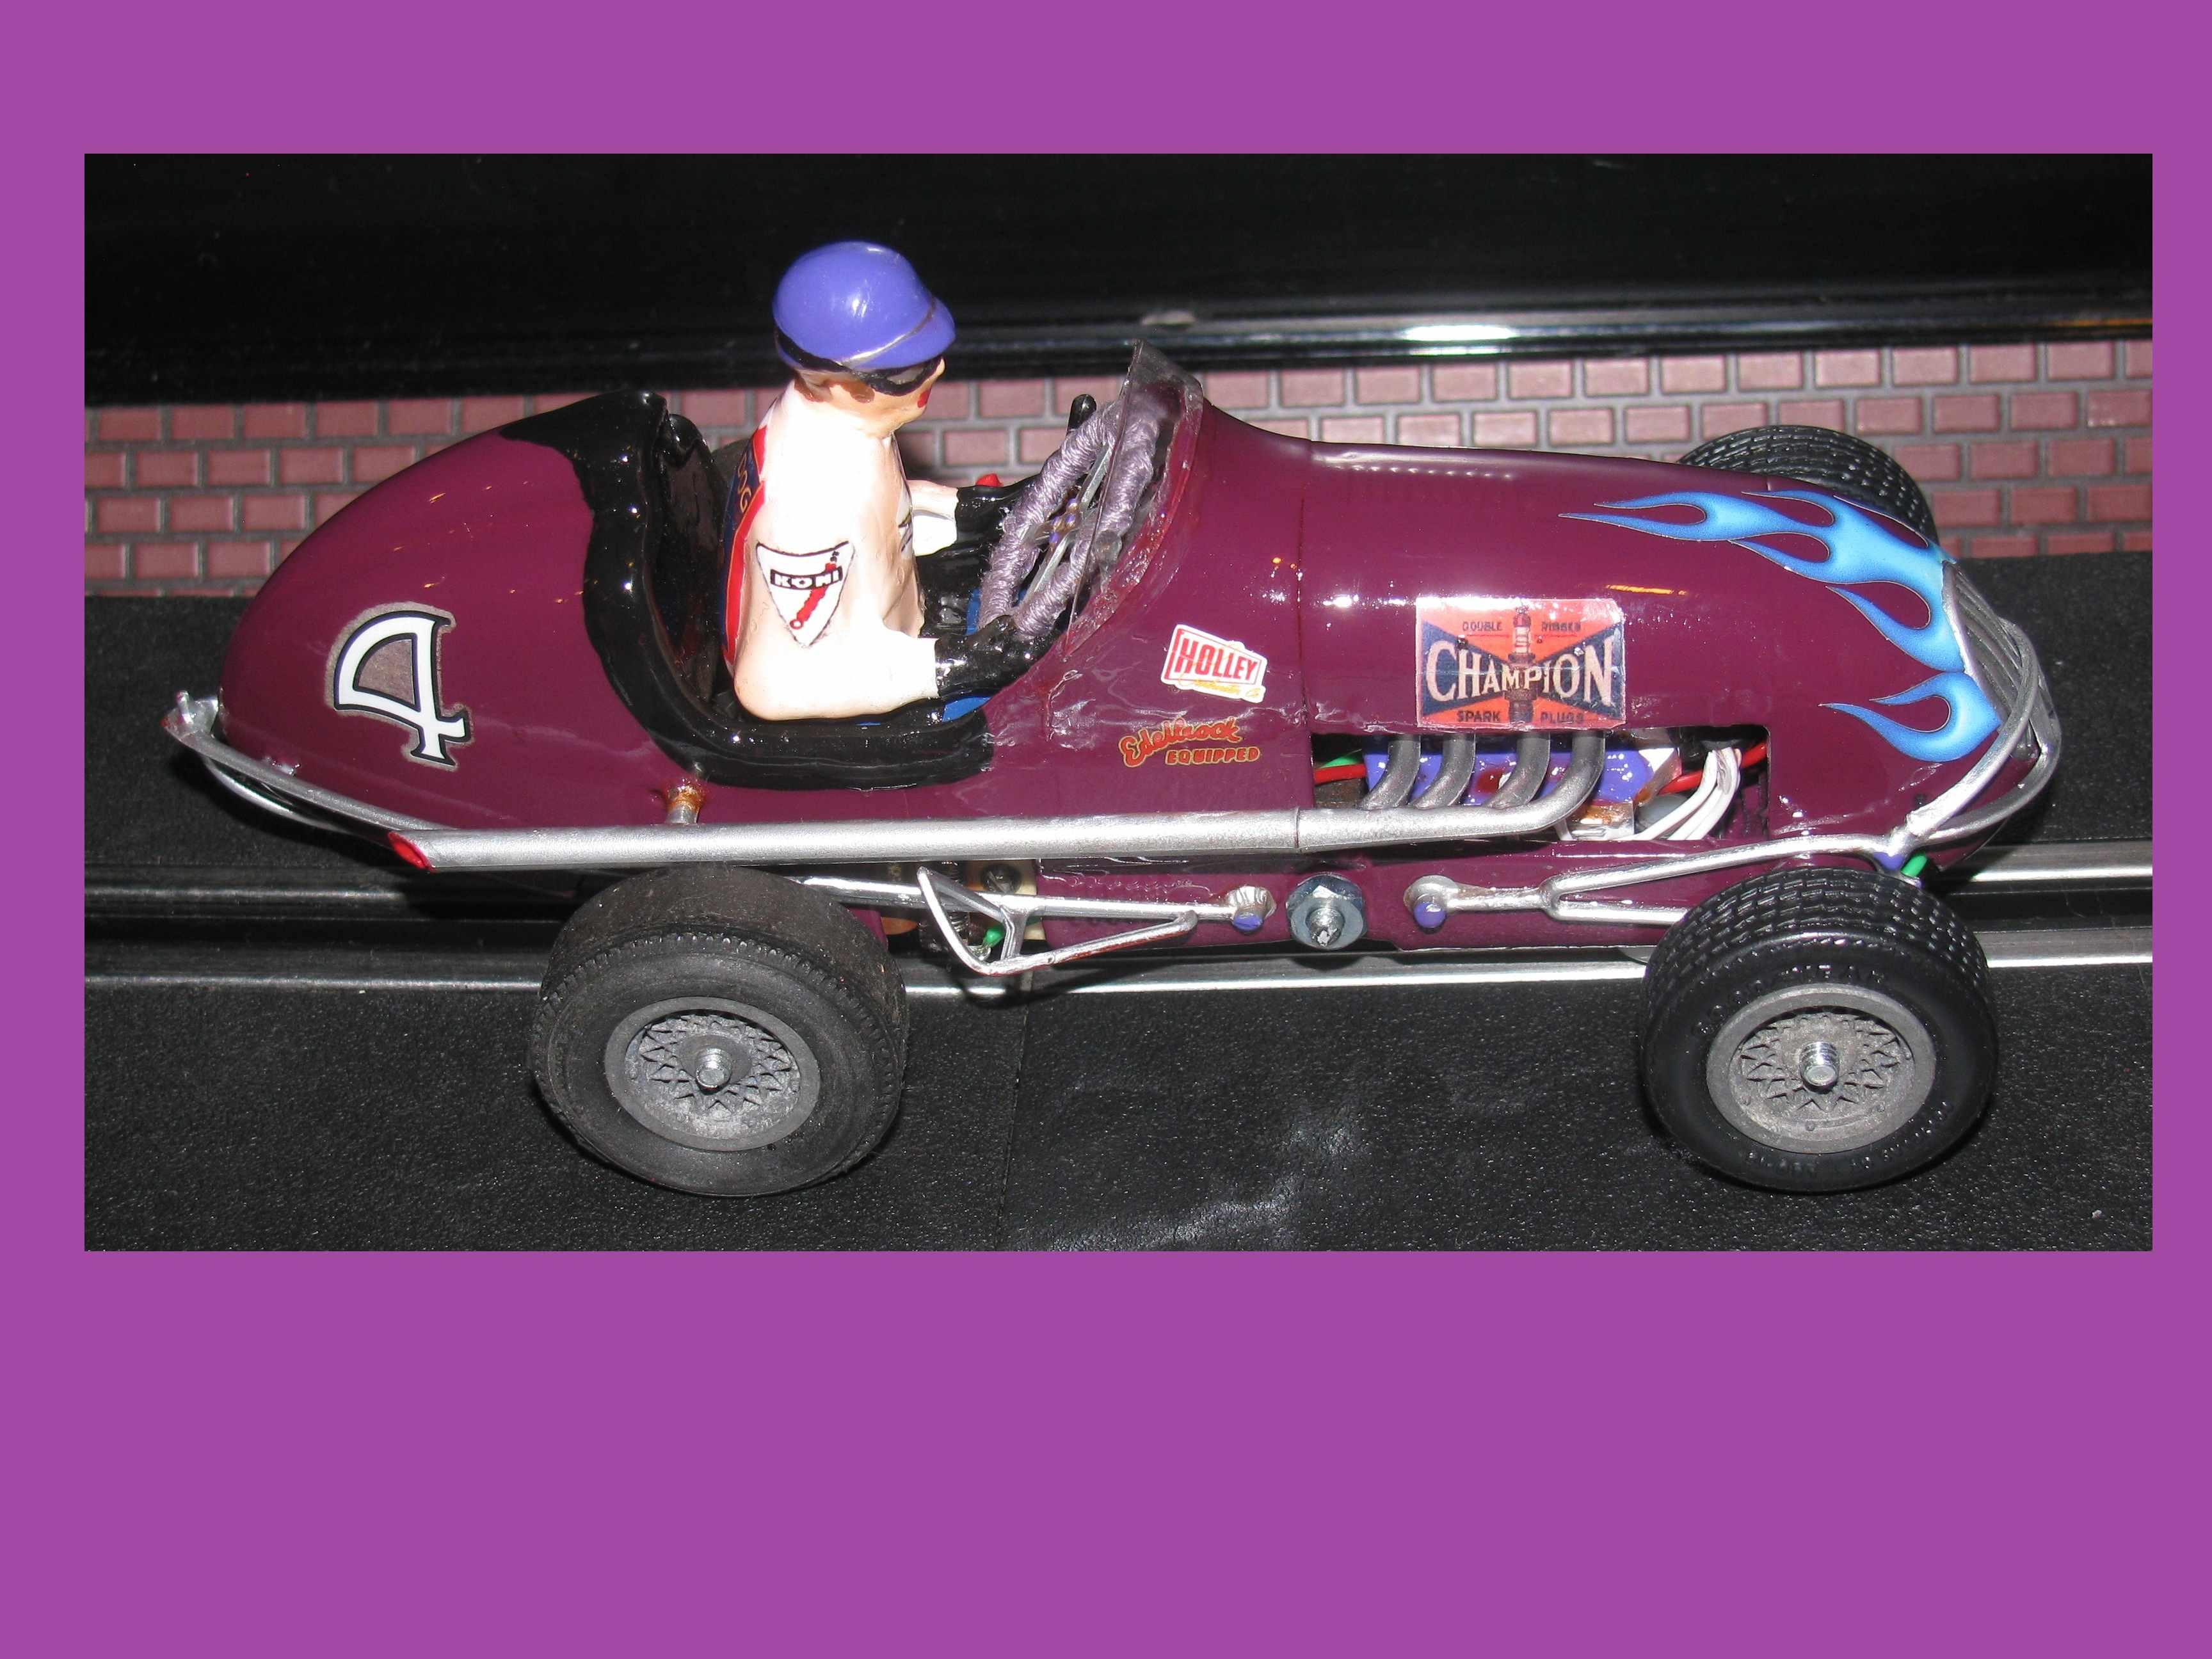 * Winter Super Sale * Monogram Midget Racer Royal Purple Racing Special Slot Car 1/24 Scale (Aubergine Satin Purple)